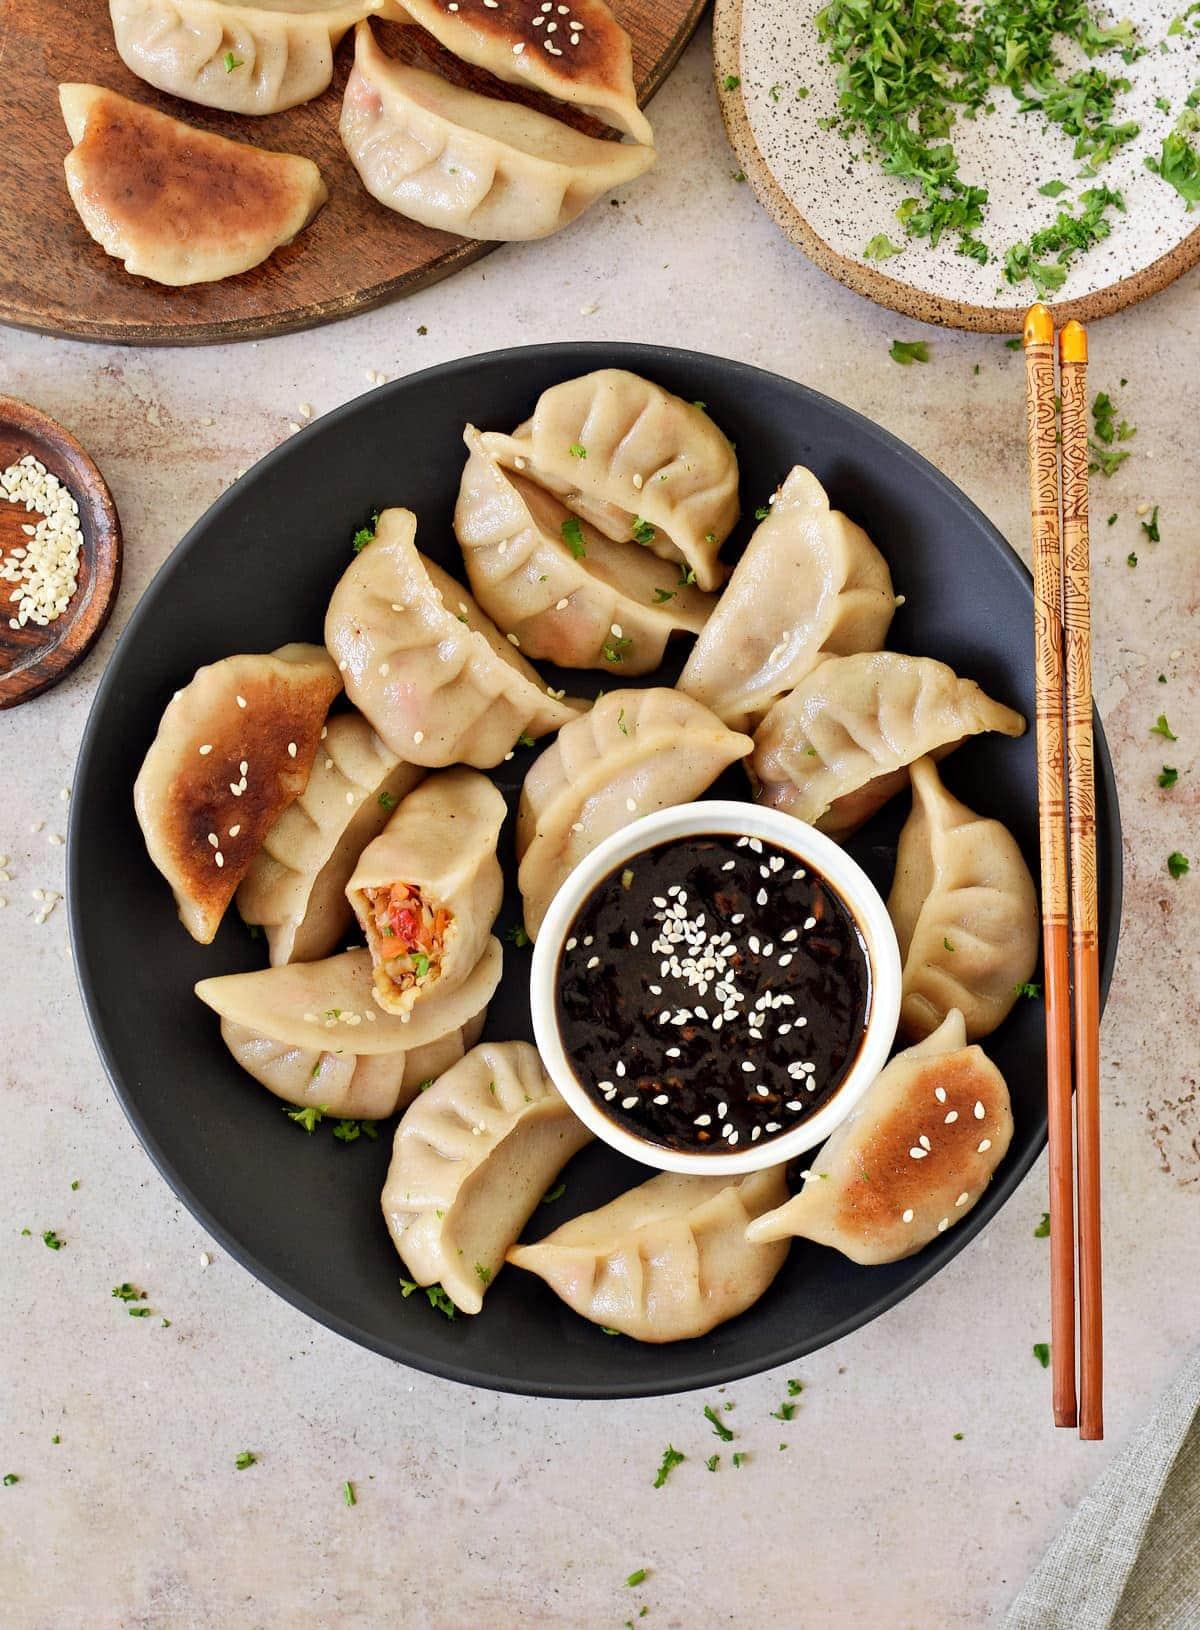 vegan dumplings on black plate with Chinese garlic sauce